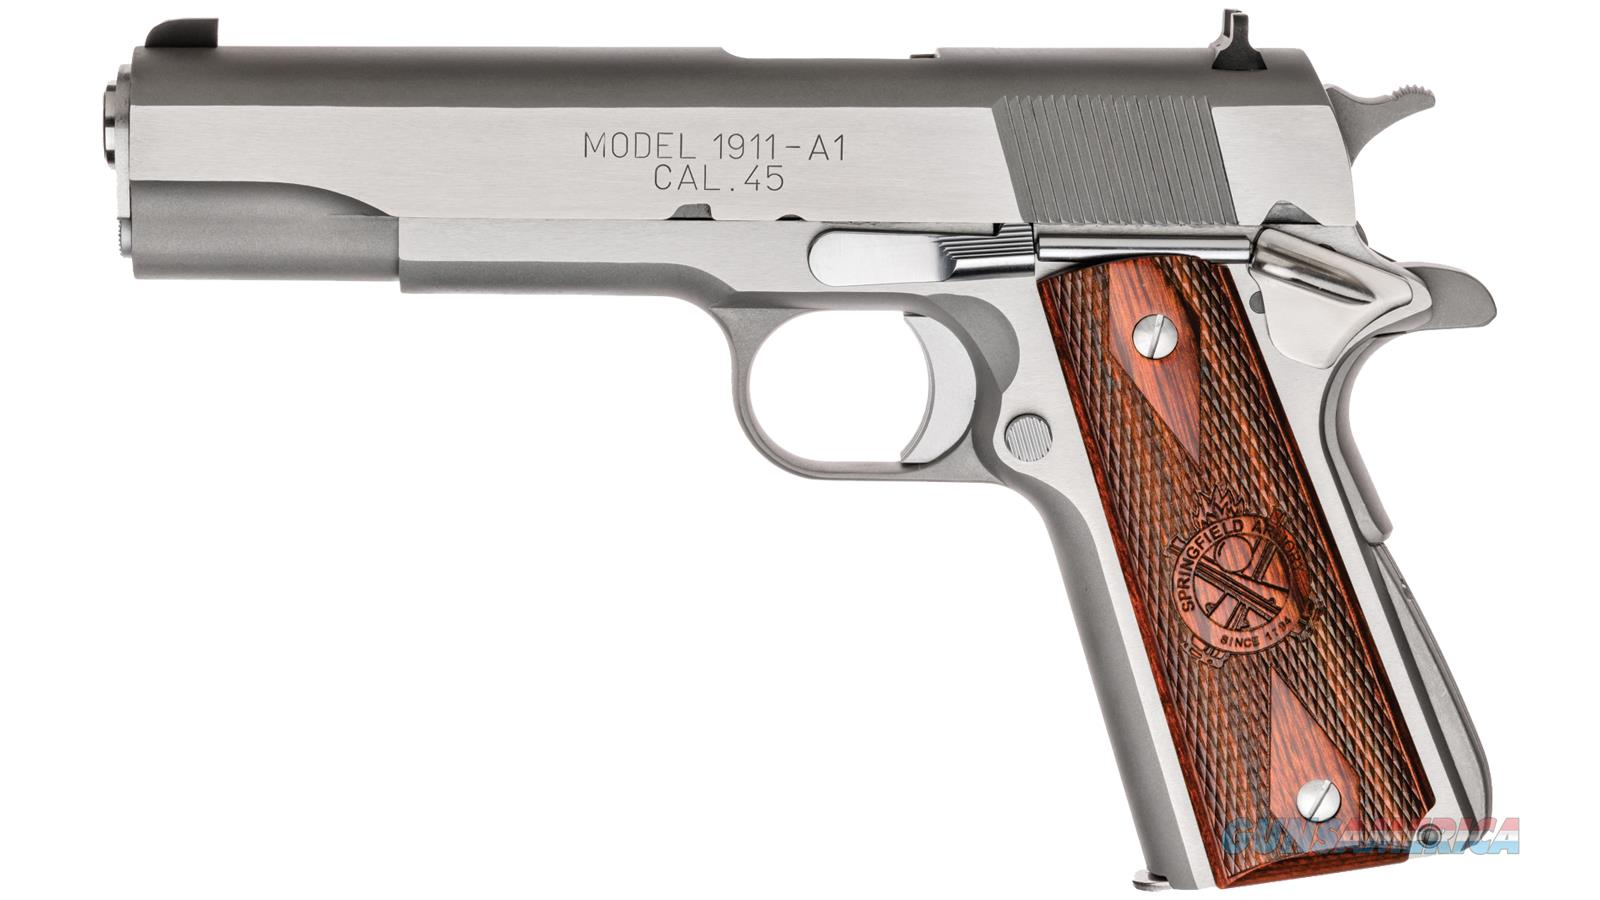 Springfield Armory 1911-A1 Mil-Spec 5 45Acp Ss Ca Legal PB9151LCA  Guns > Pistols > S Misc Pistols